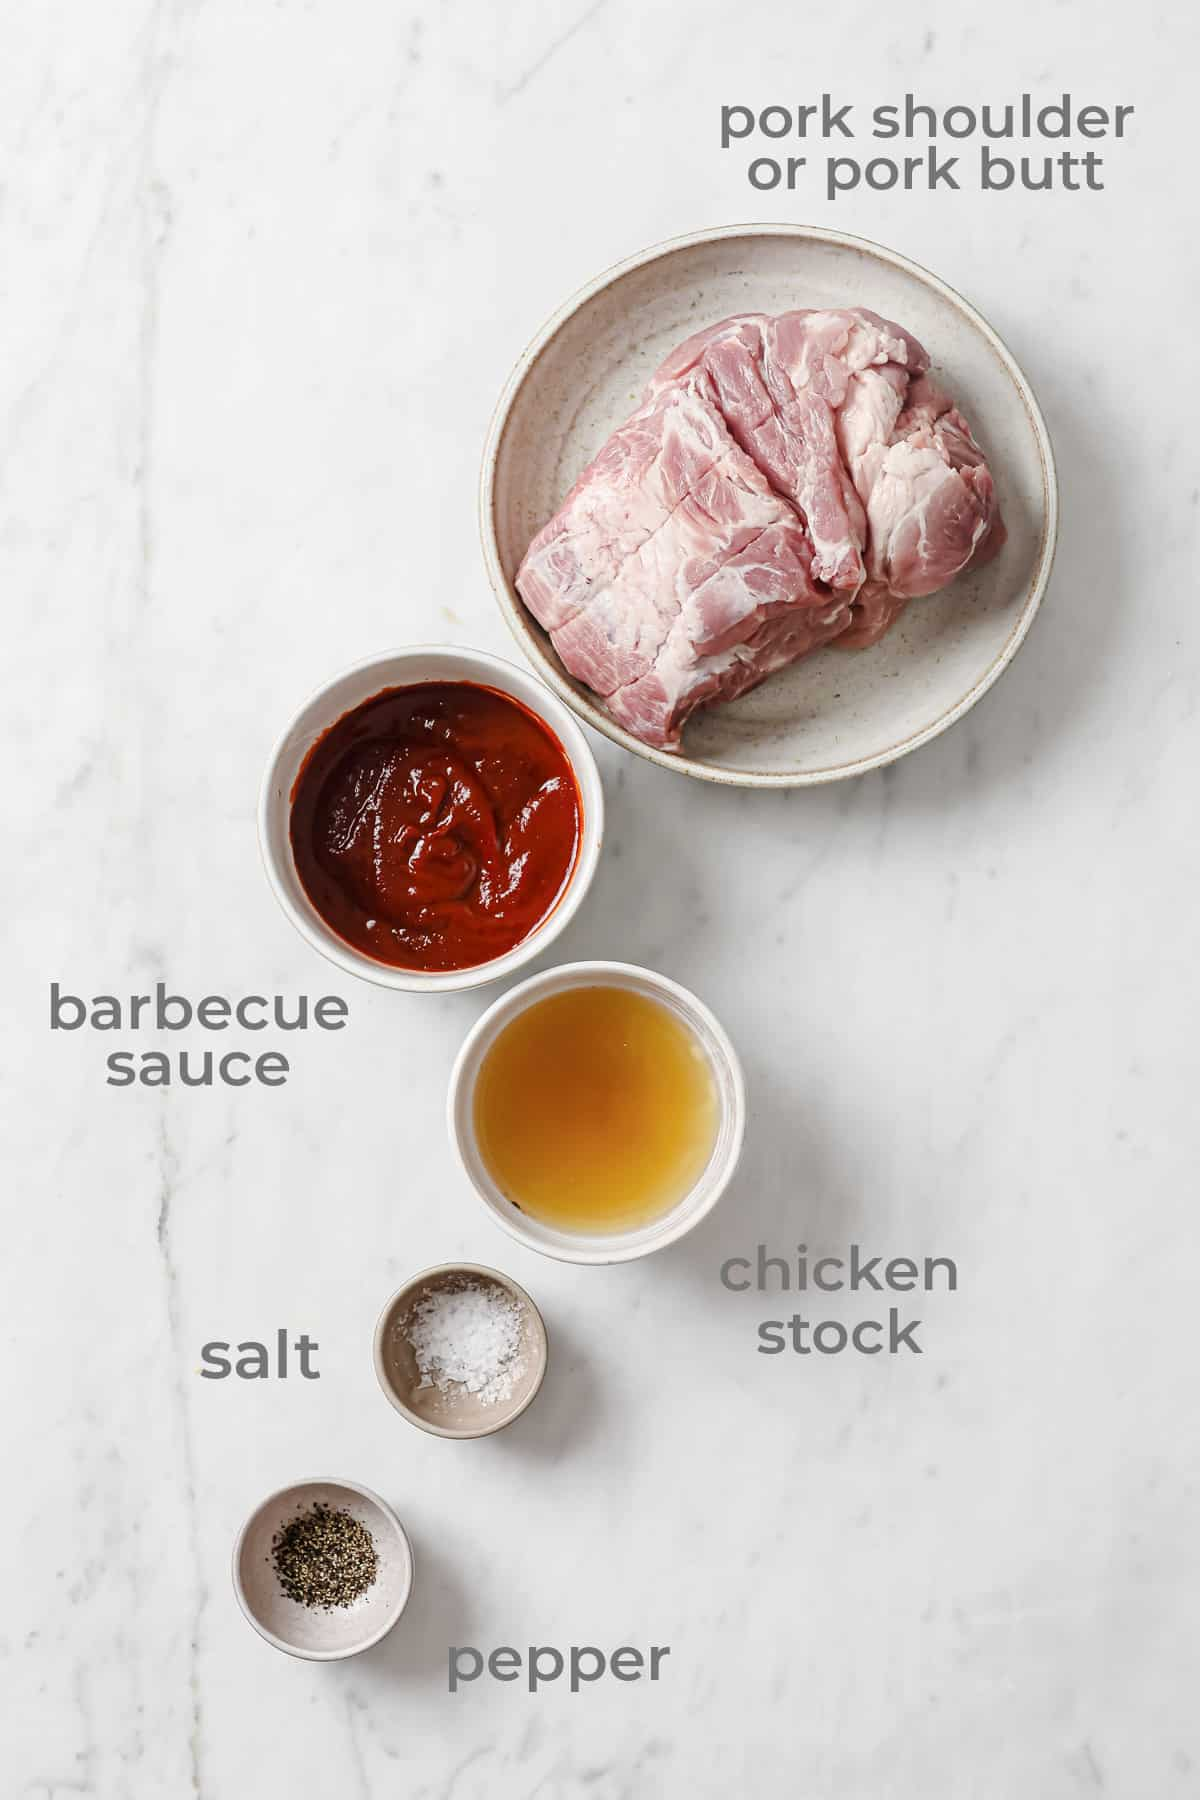 Ingredients to make keto barbecue pulled pork - pork shoulder, barbecue sauce, chicken stock, salt and pepper